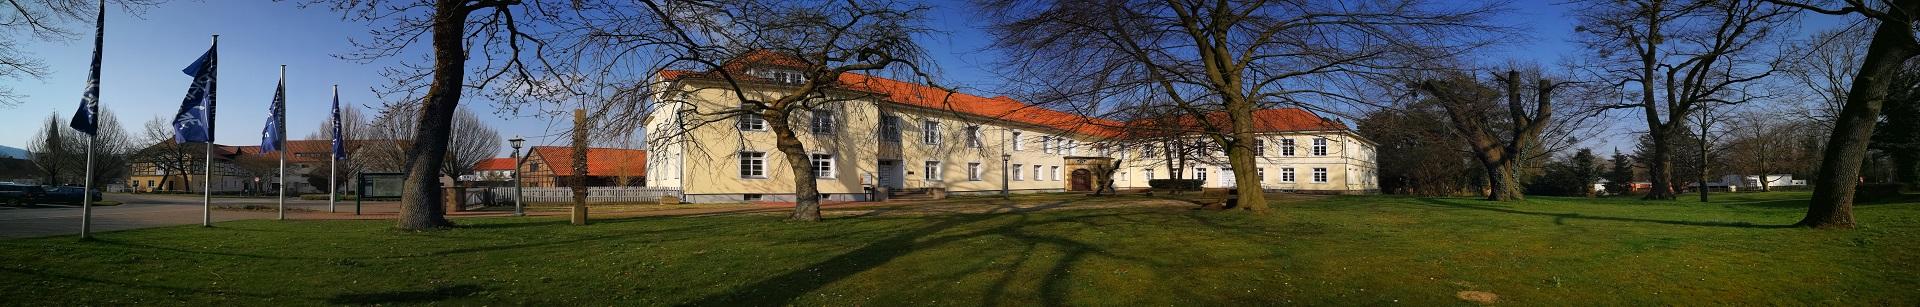 Rathaus im April